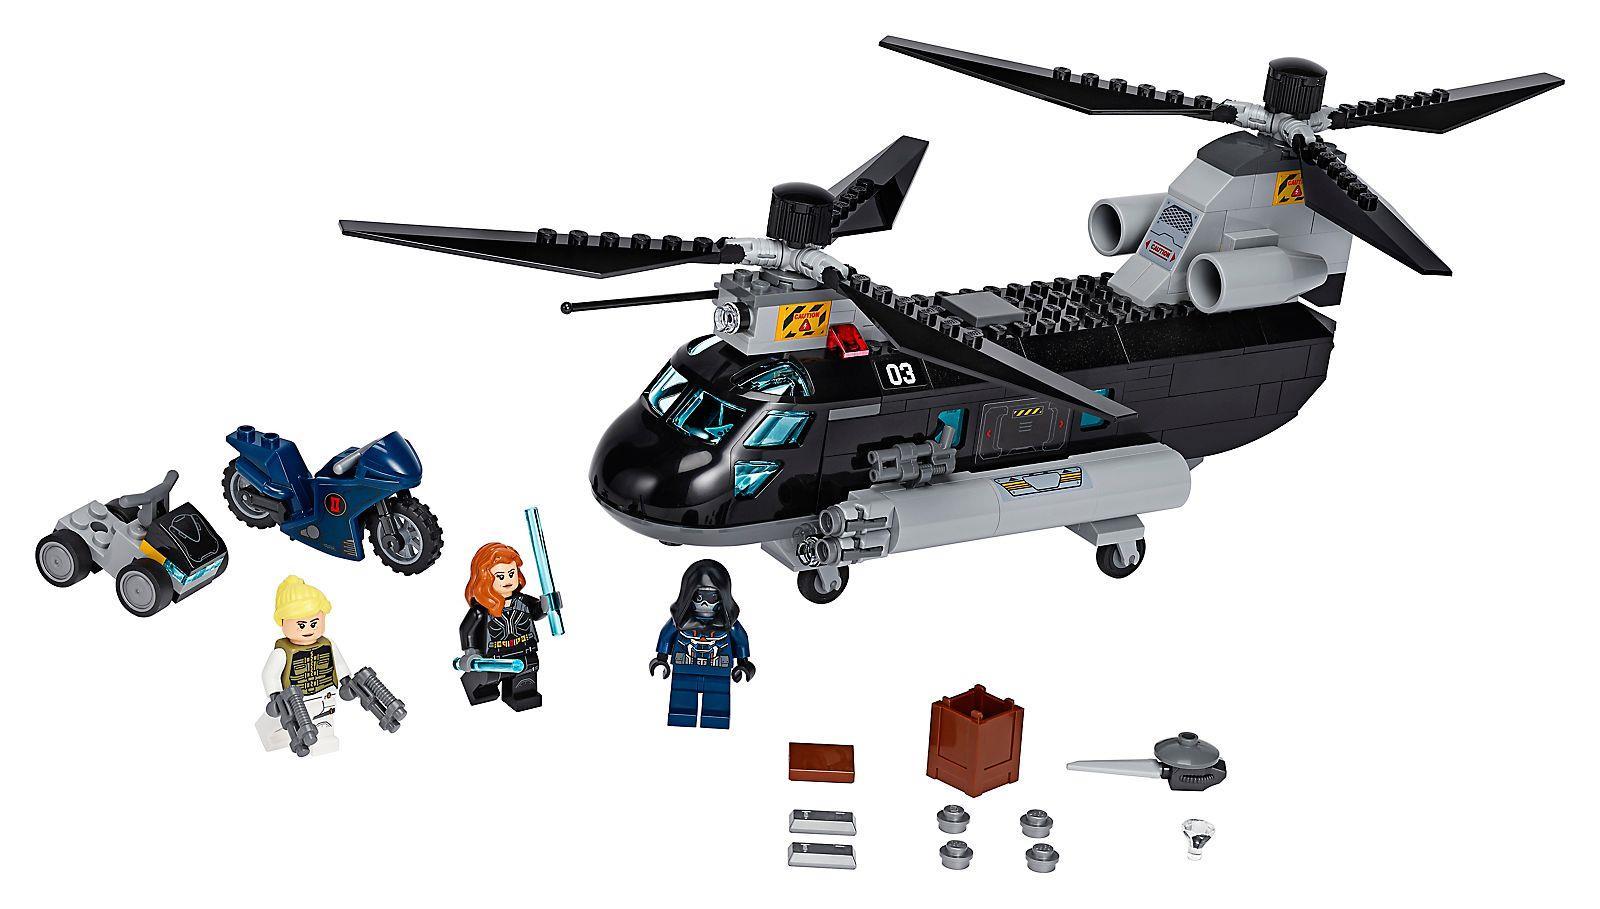 LEGO MARVEL SUPER HEROES TASKMASTER MINIFIGURE 76162 W// WEAPONS LOOSE TOY